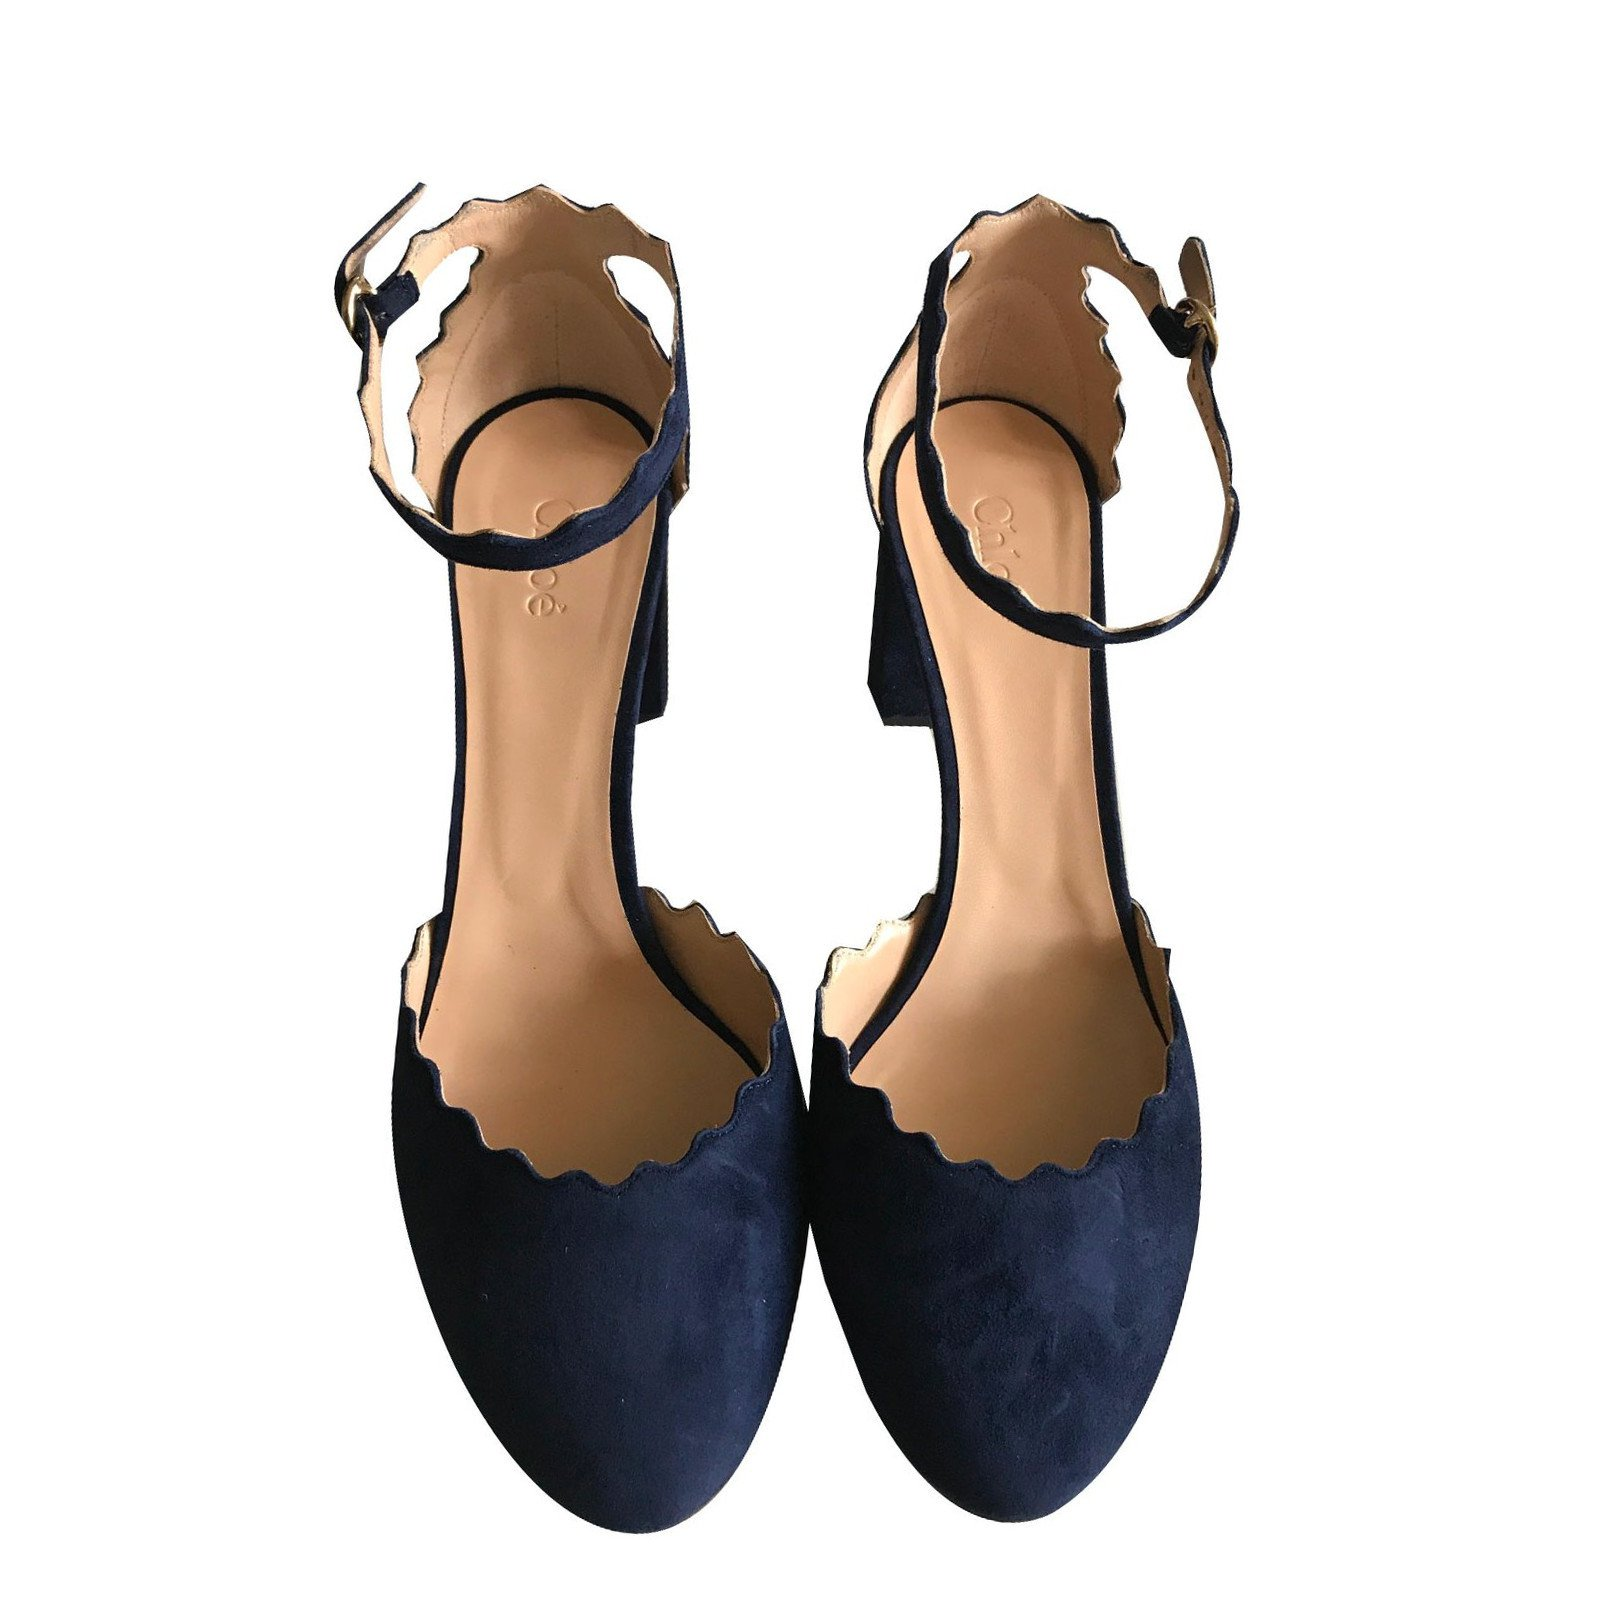 2fc7a5c9052c Chloé Sandals Lauren Sandals Deerskin Navy blue ref.44365 - Joli Closet